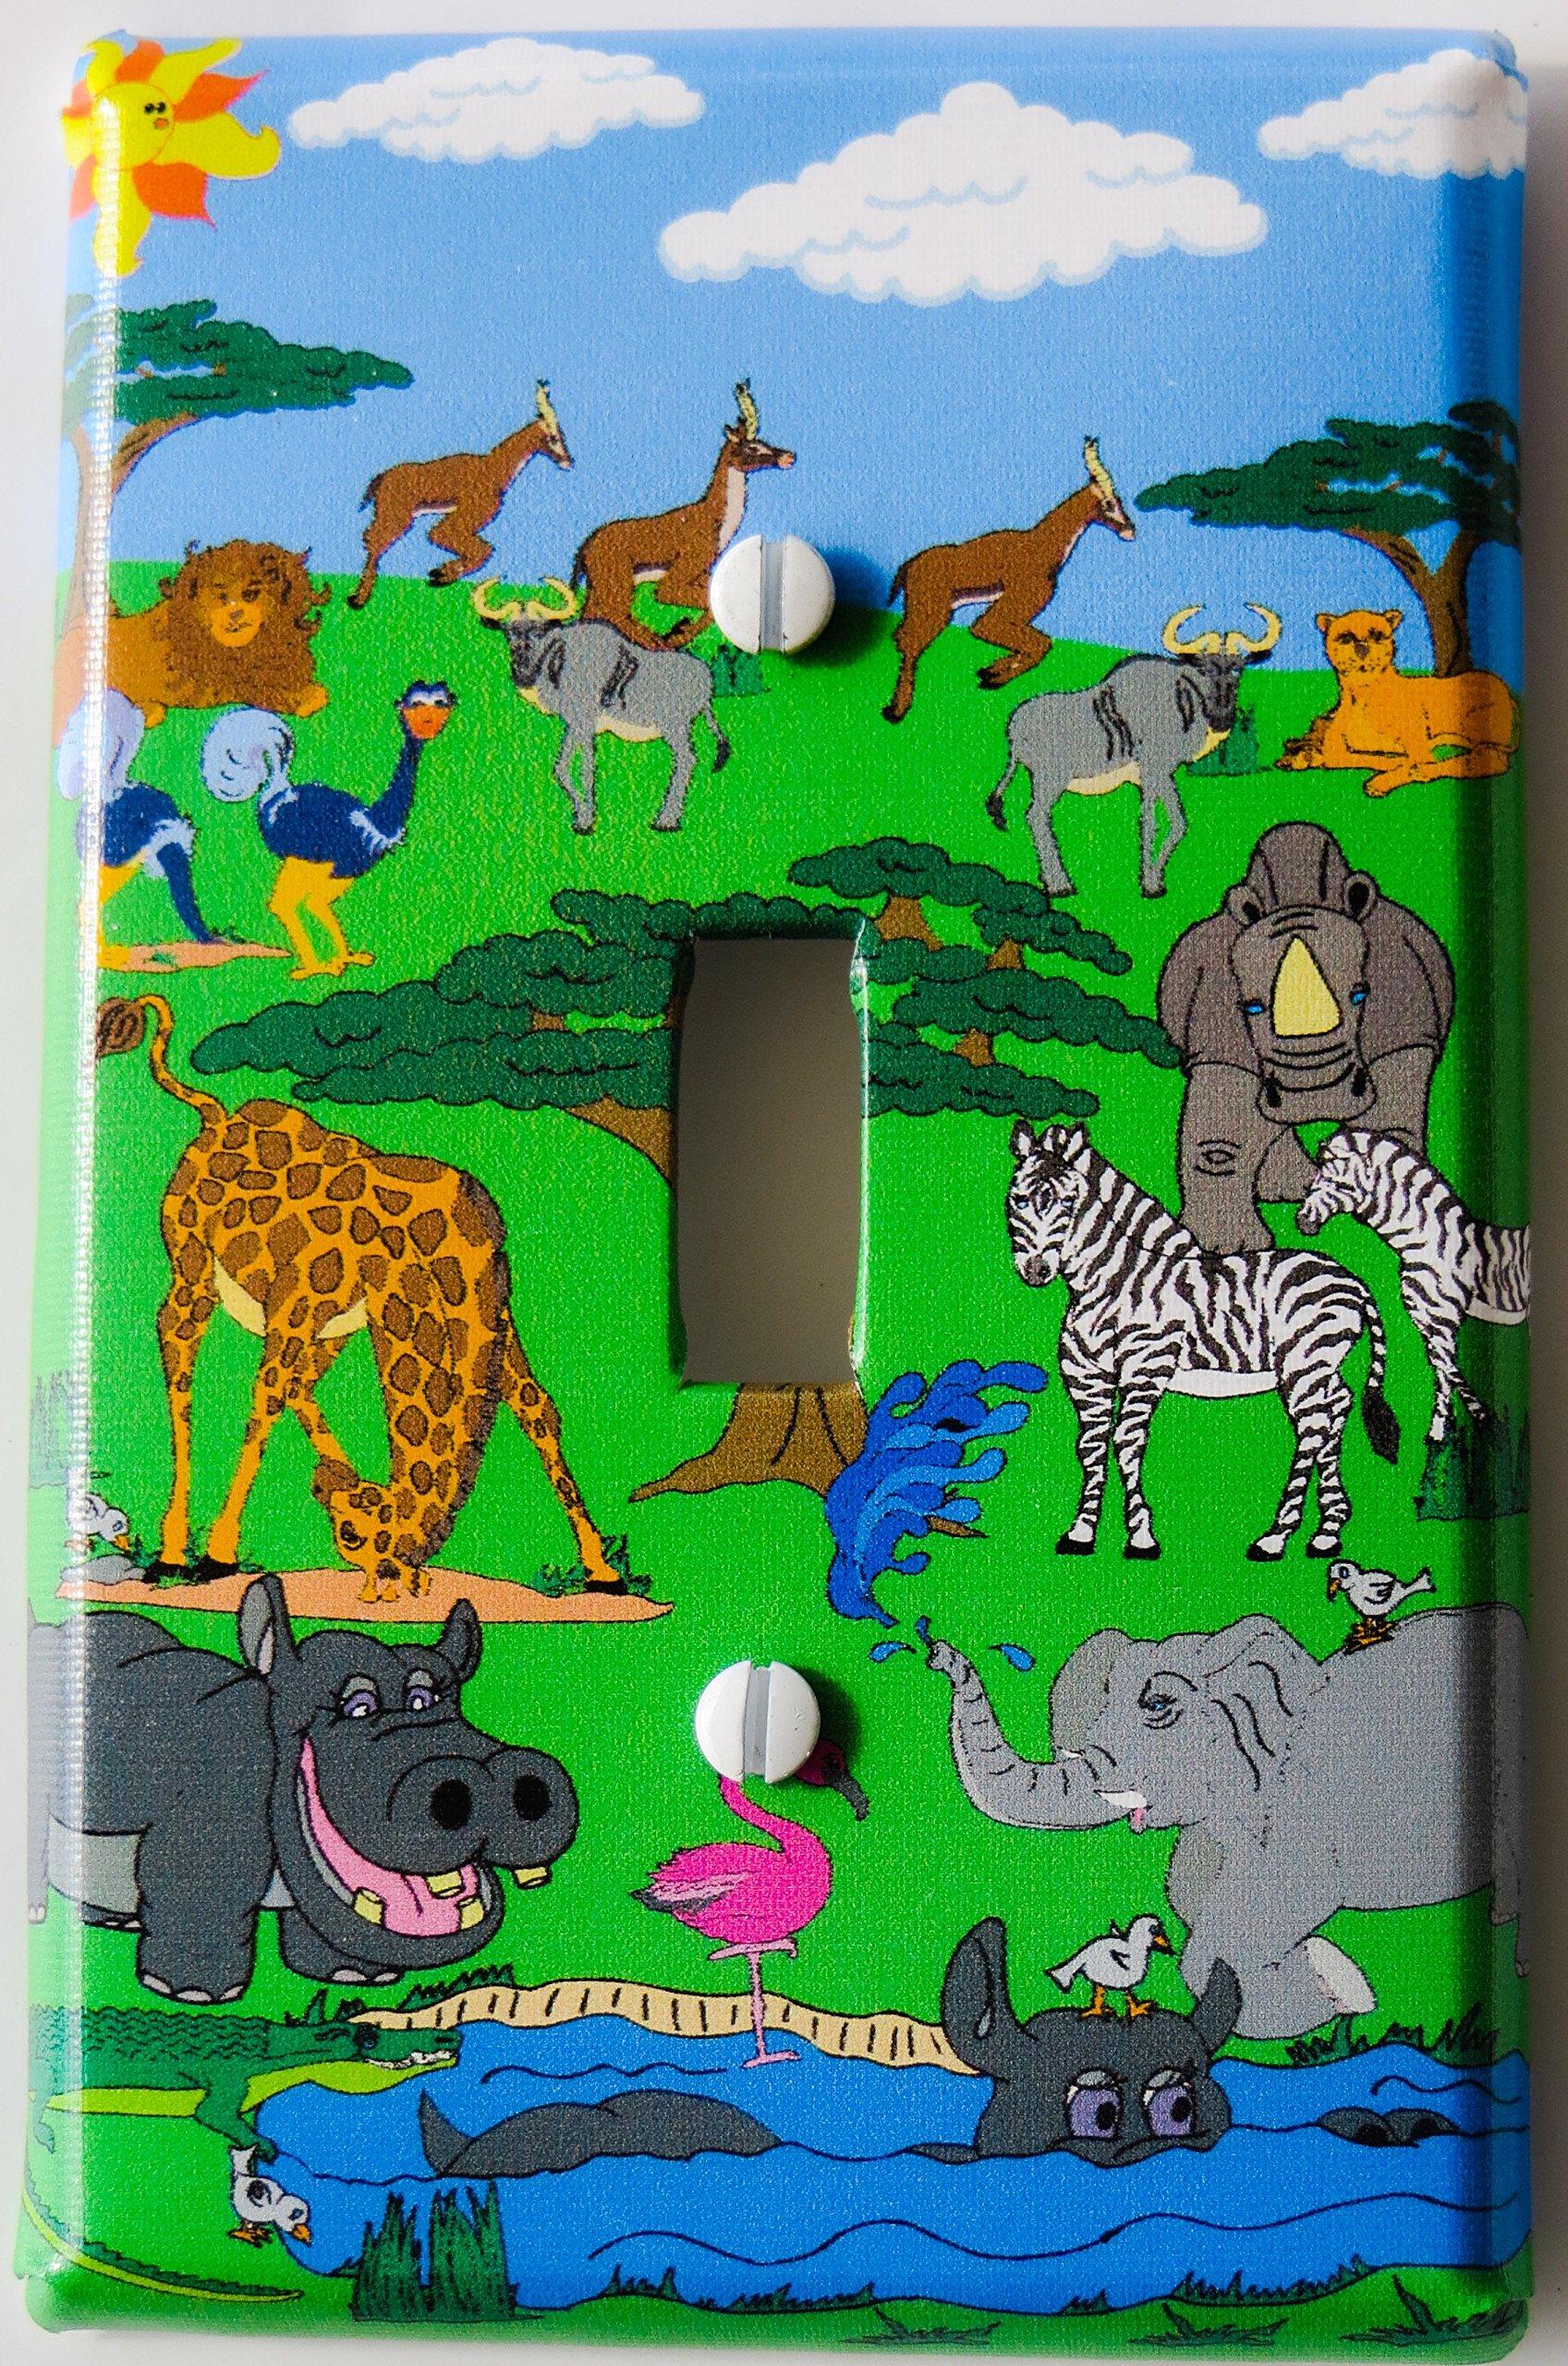 Animals Safari Light Switch Plate Cover/ Single Toggle / Safari Wall Decor with Zebras, Giraffes, Hippos, Elephants, Flamingo, Giselle, and Water Buffalo